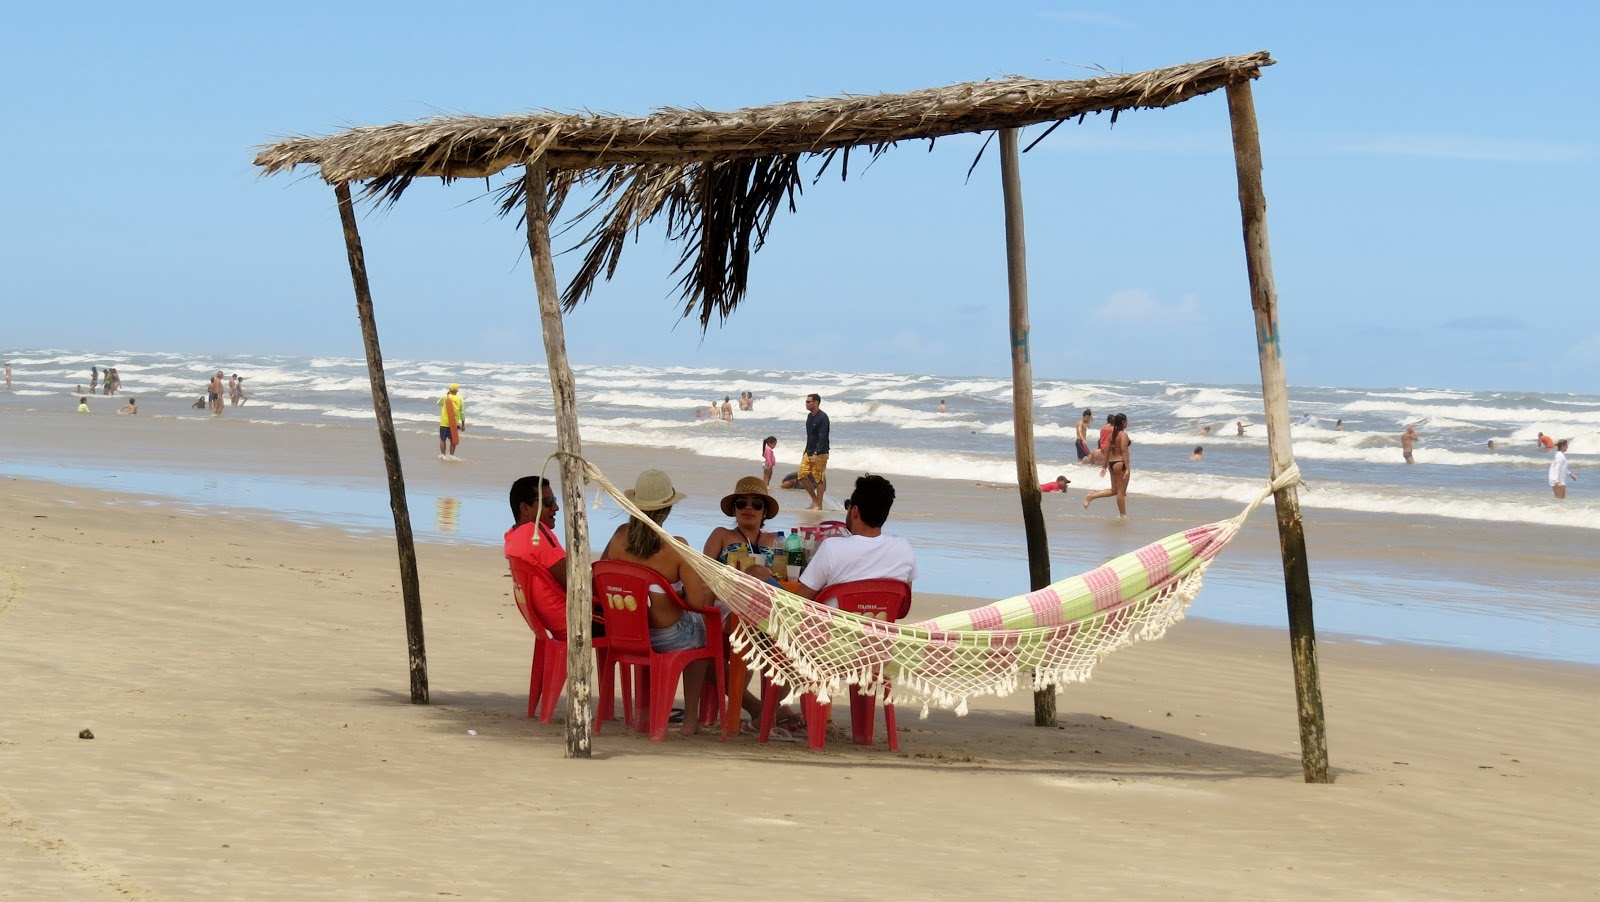 Tenda na praia de Mangue Seco Bahia